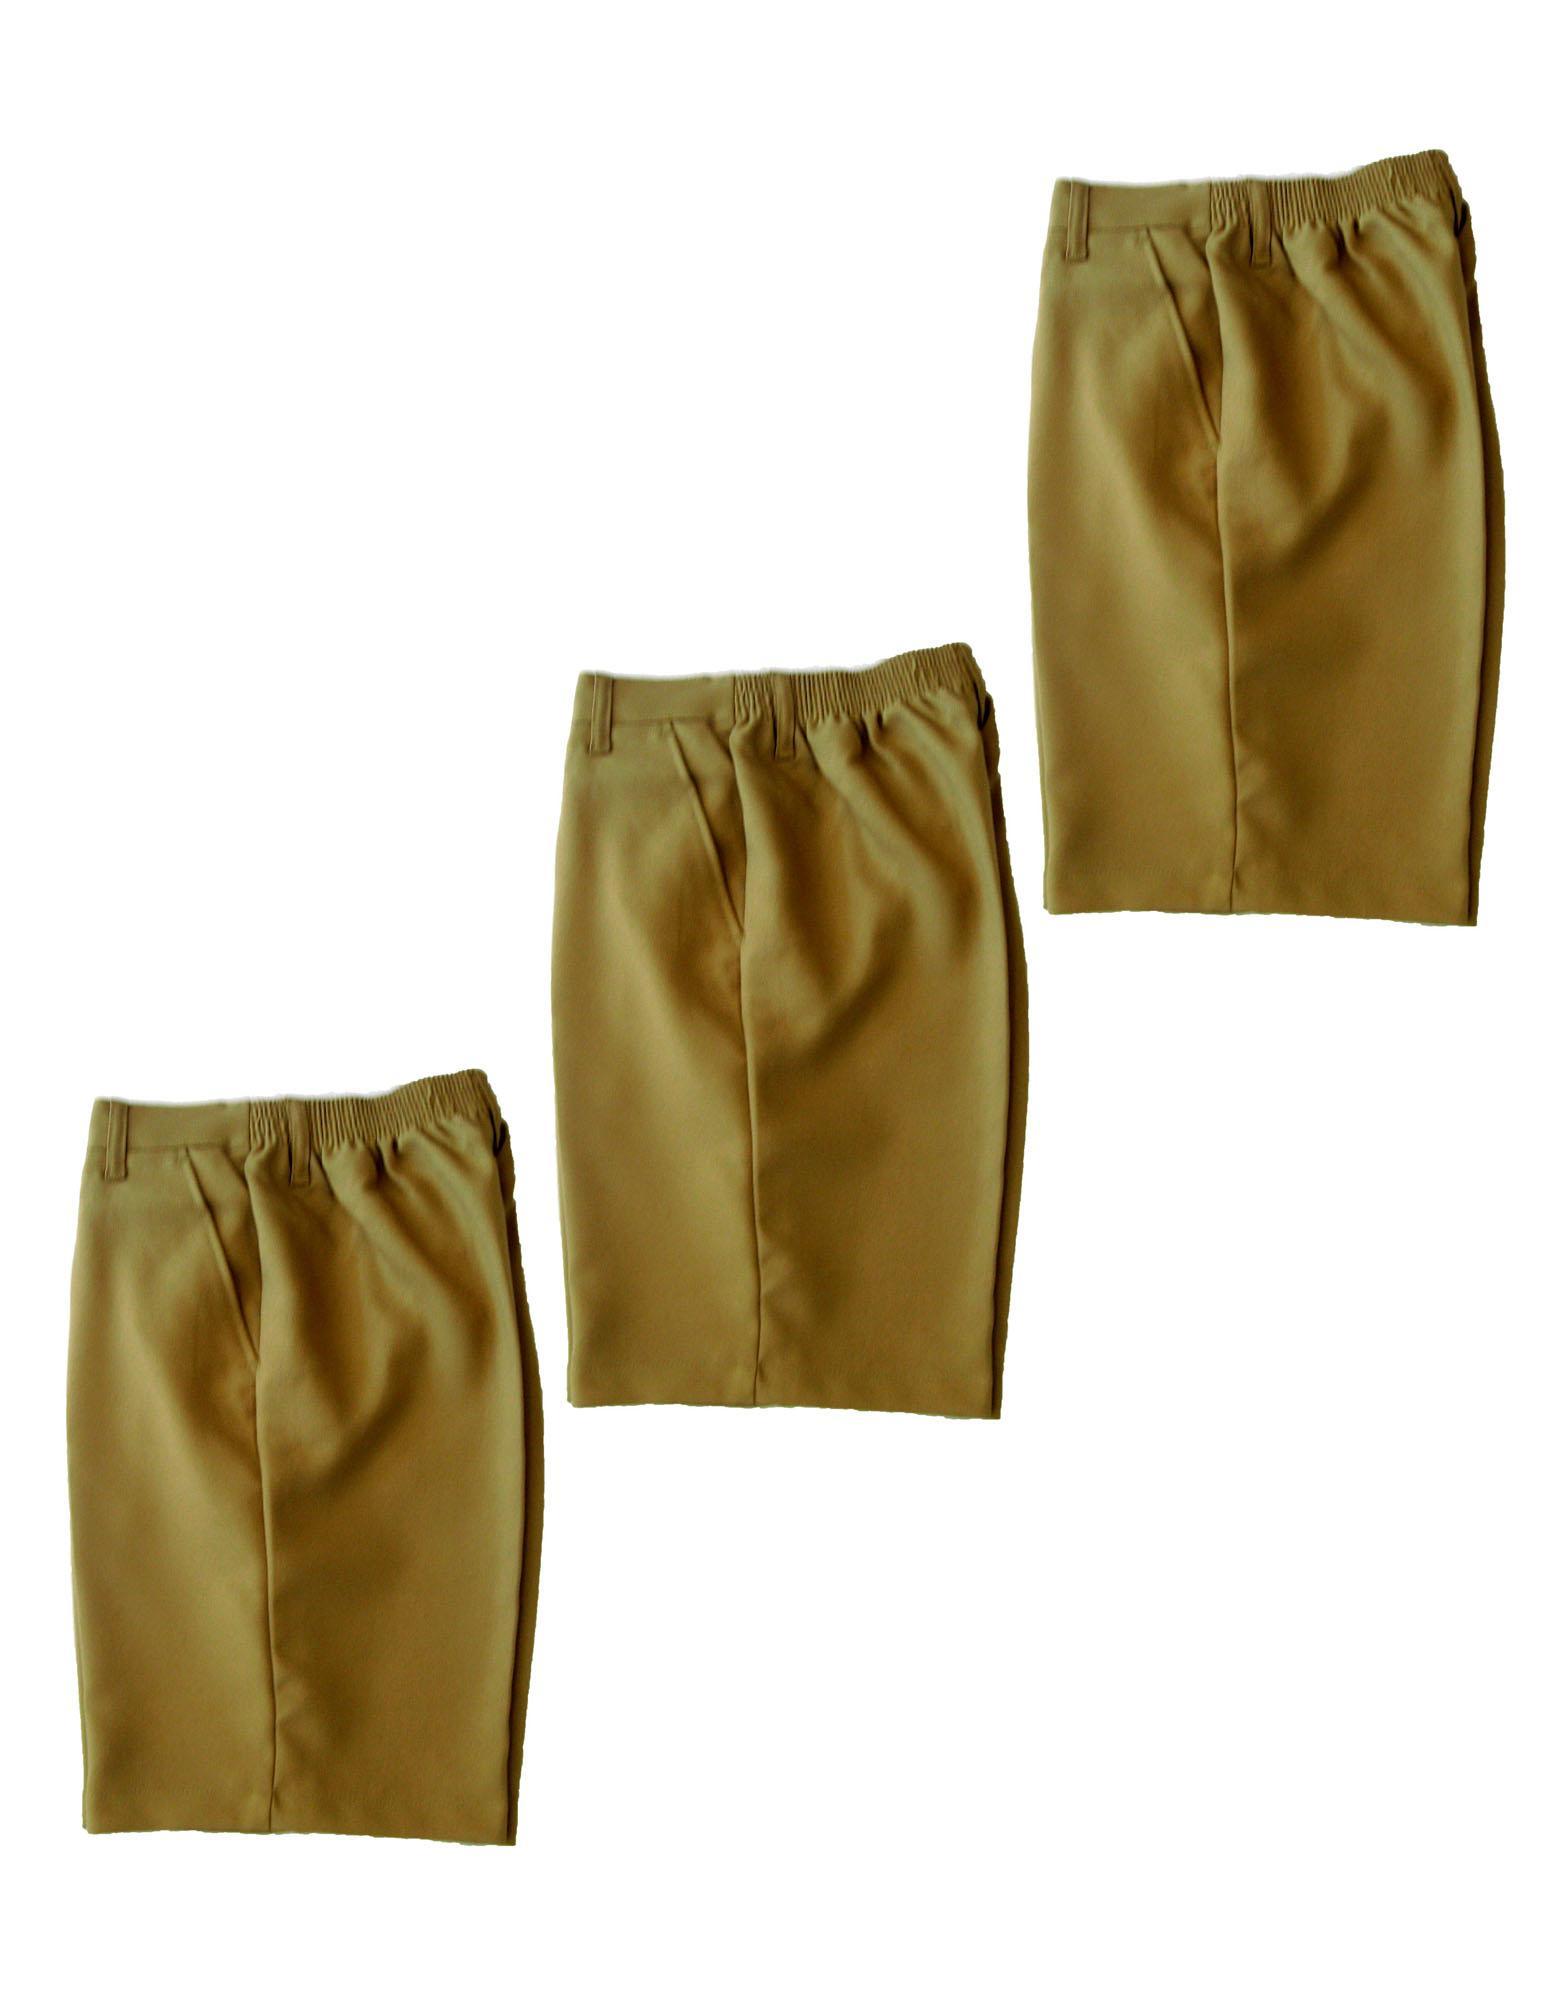 Henson School Uniform Boys Short Pants Khaki Set Of 3 (size: 4-12 Yrs) By Uniforms At Work.